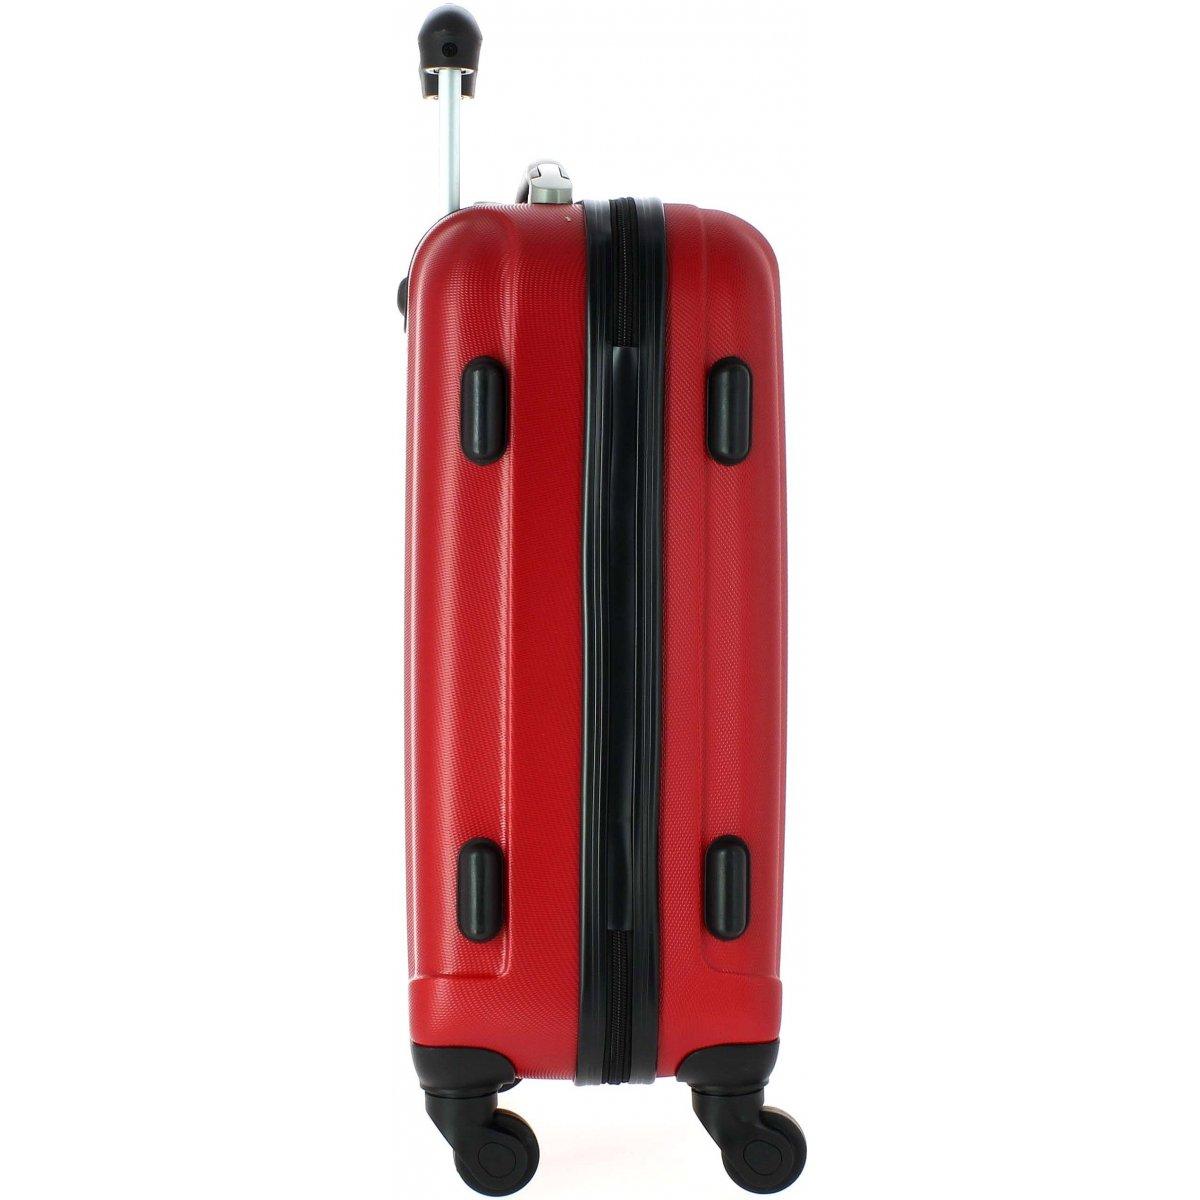 valise cabine david jones ba10111p couleur principale. Black Bedroom Furniture Sets. Home Design Ideas